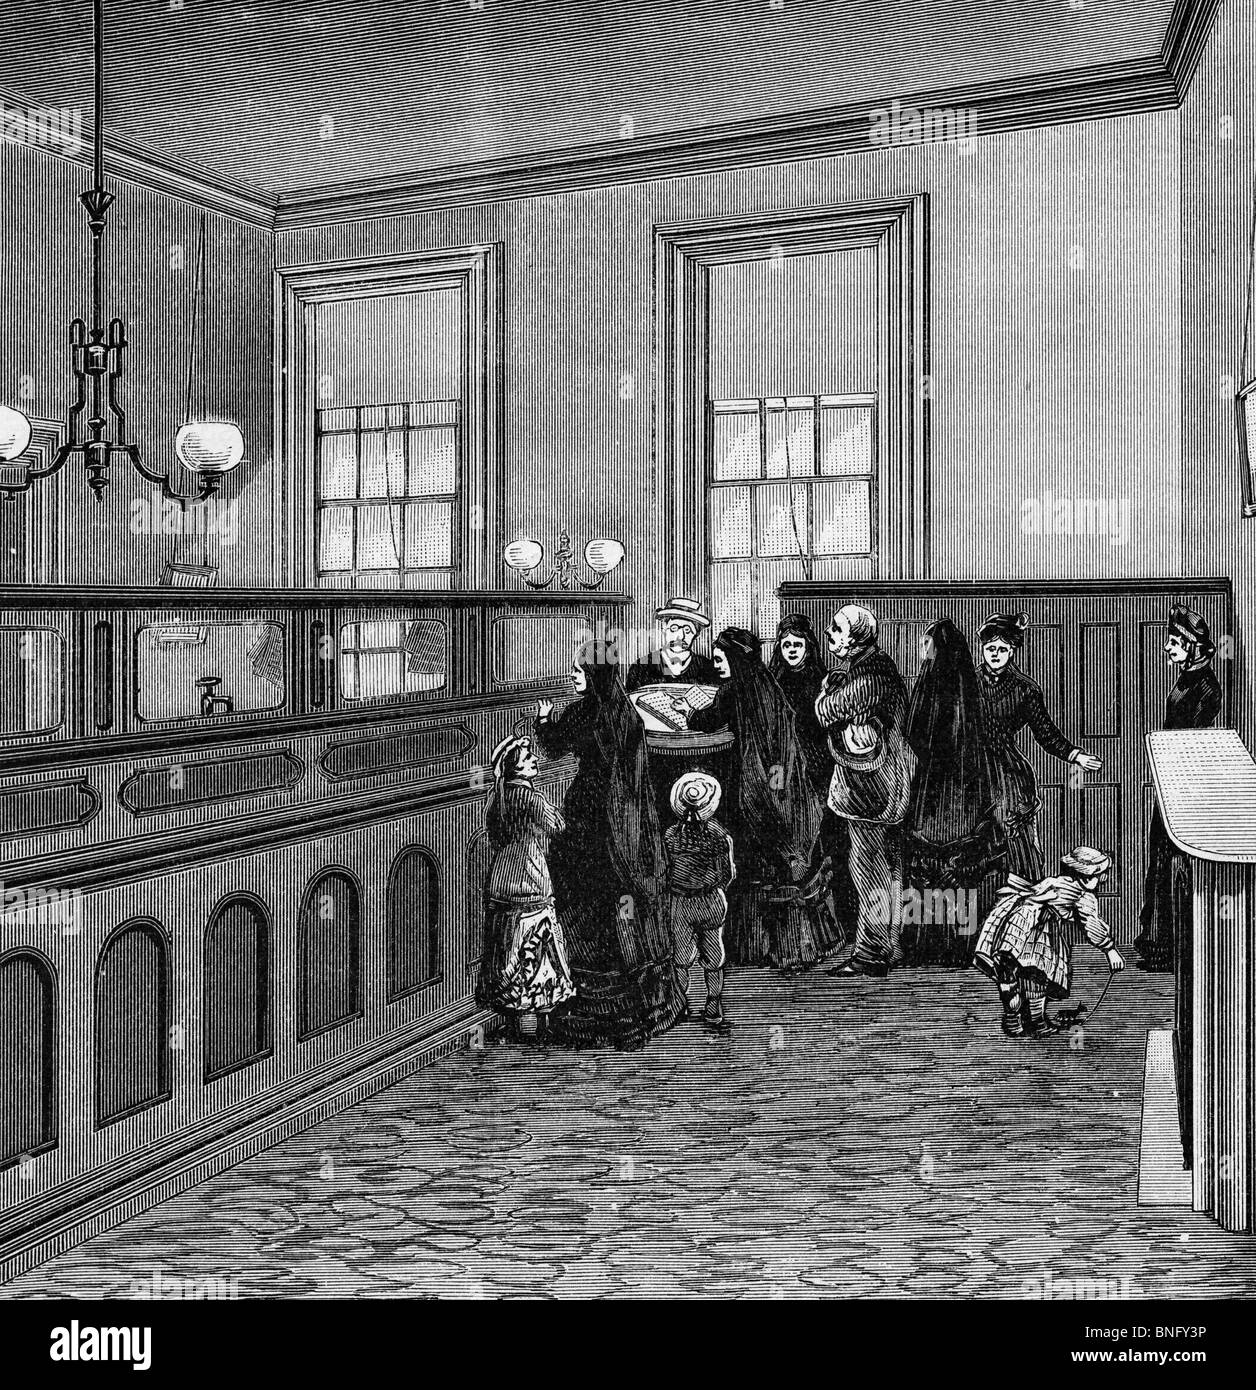 Bookeeper Gott's Office, de: nos protecteurs de la police, de l'histoire de la Police de New York, publiée en 1885 Banque D'Images